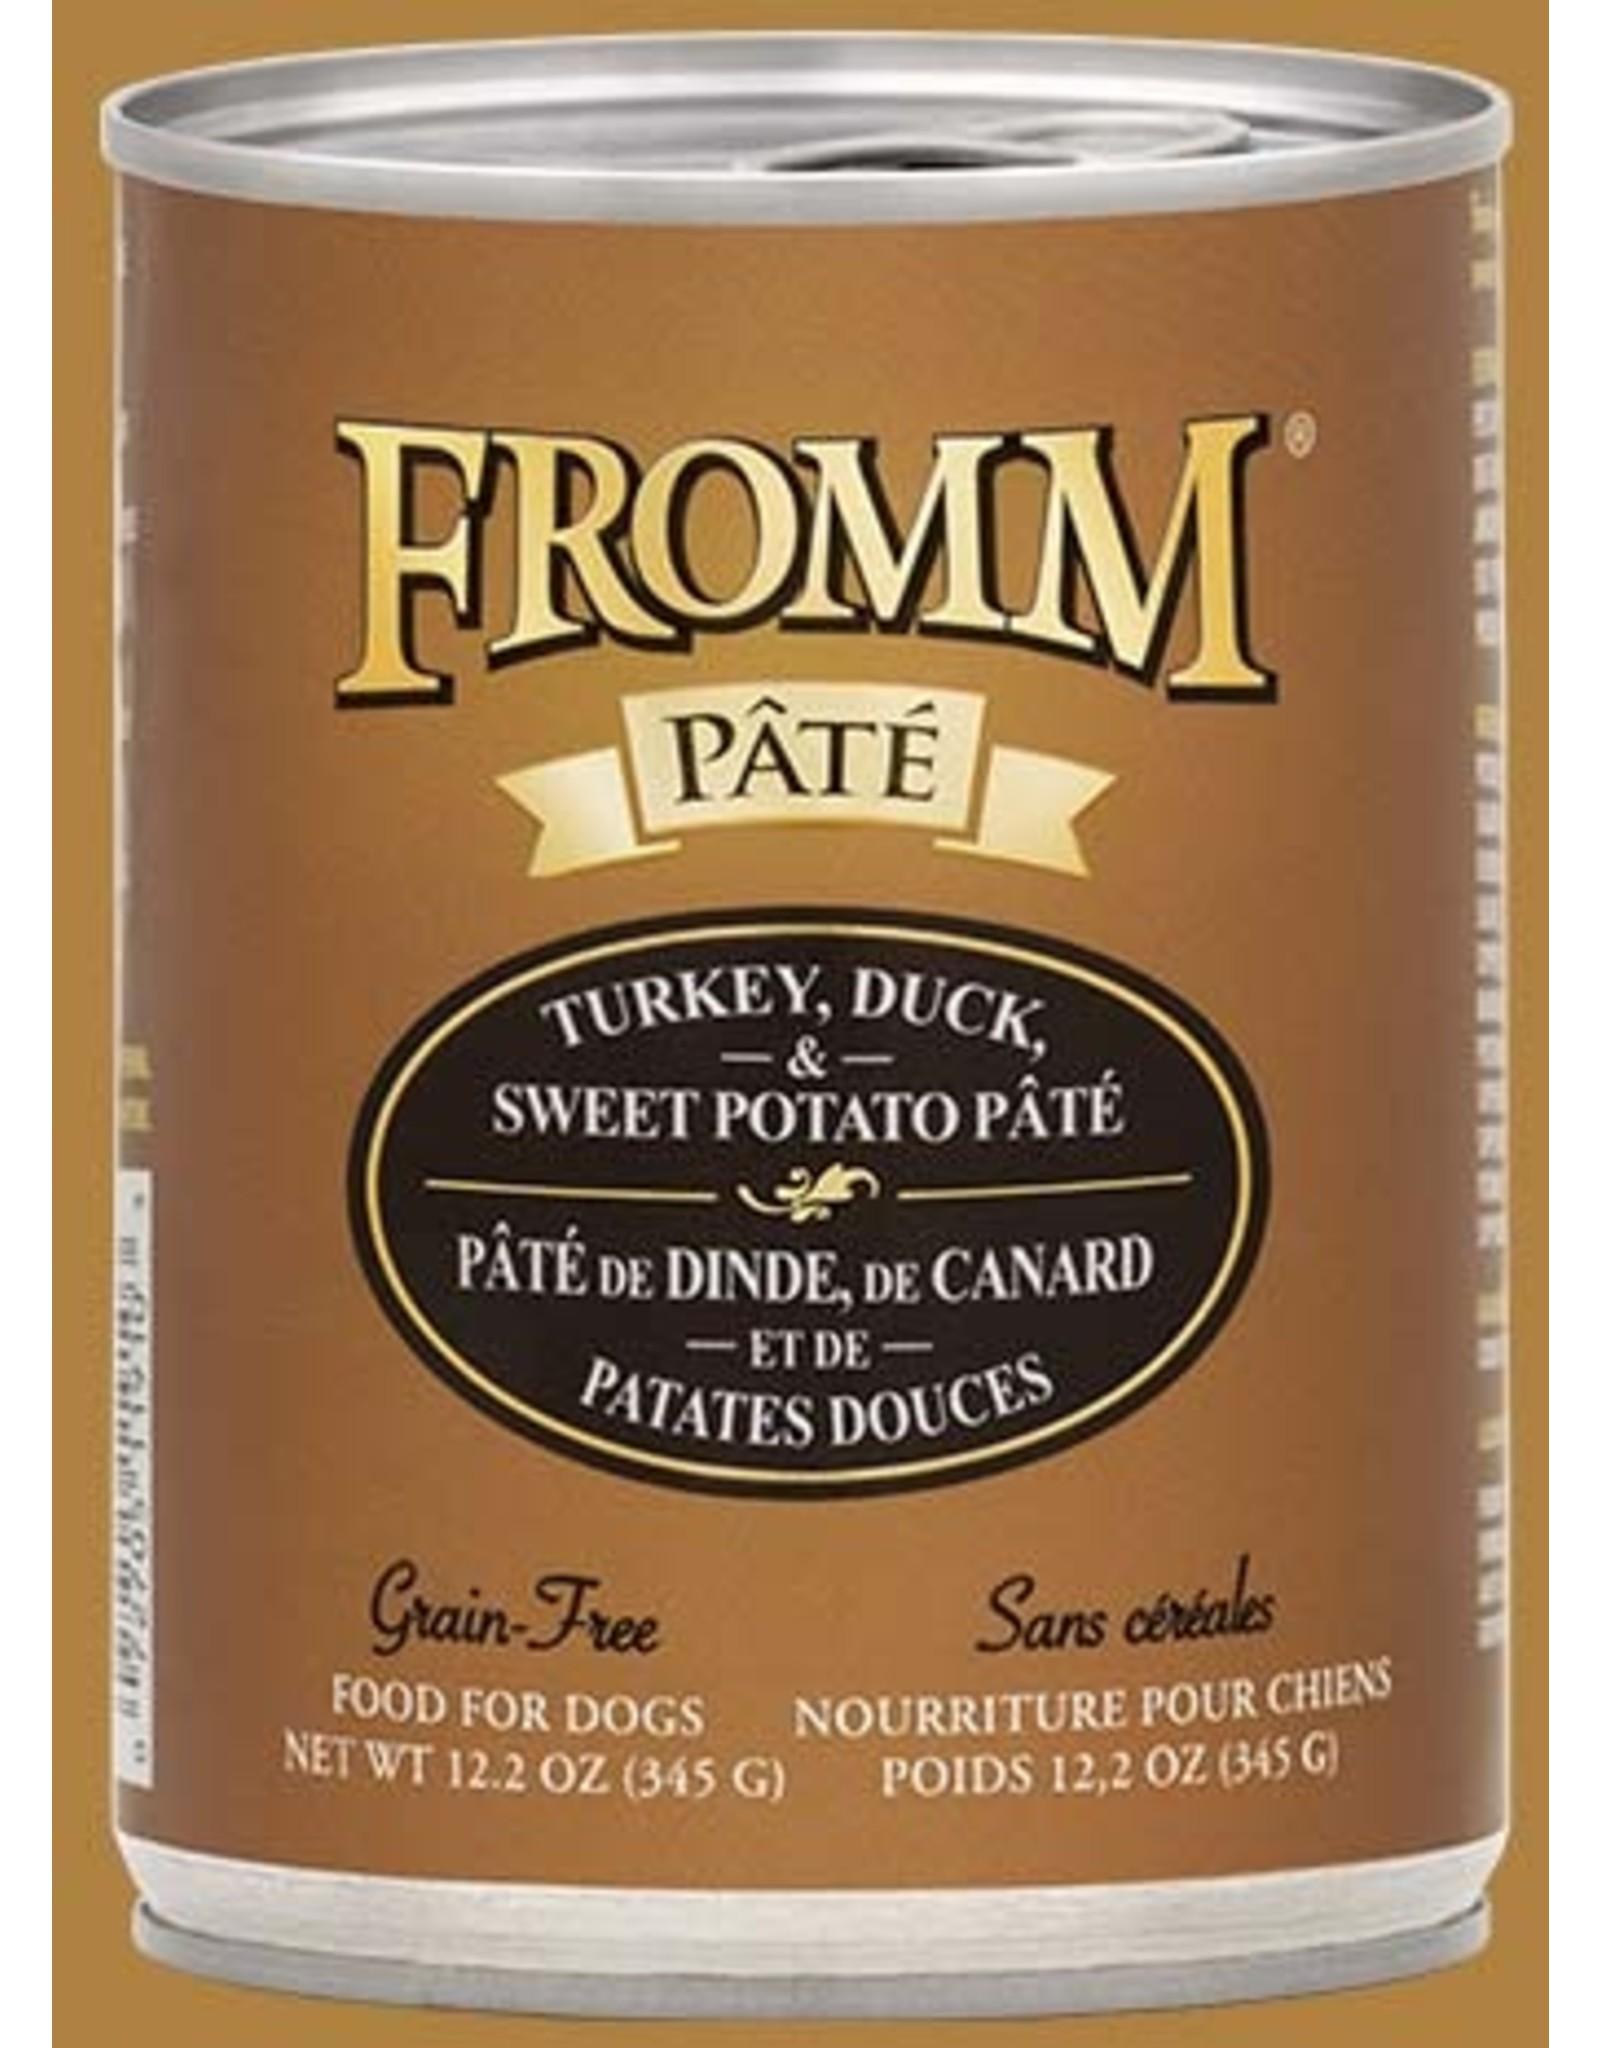 Fromm Fromm Gold G FTurkey, Duck & Sweet Potato Pate Wet Food